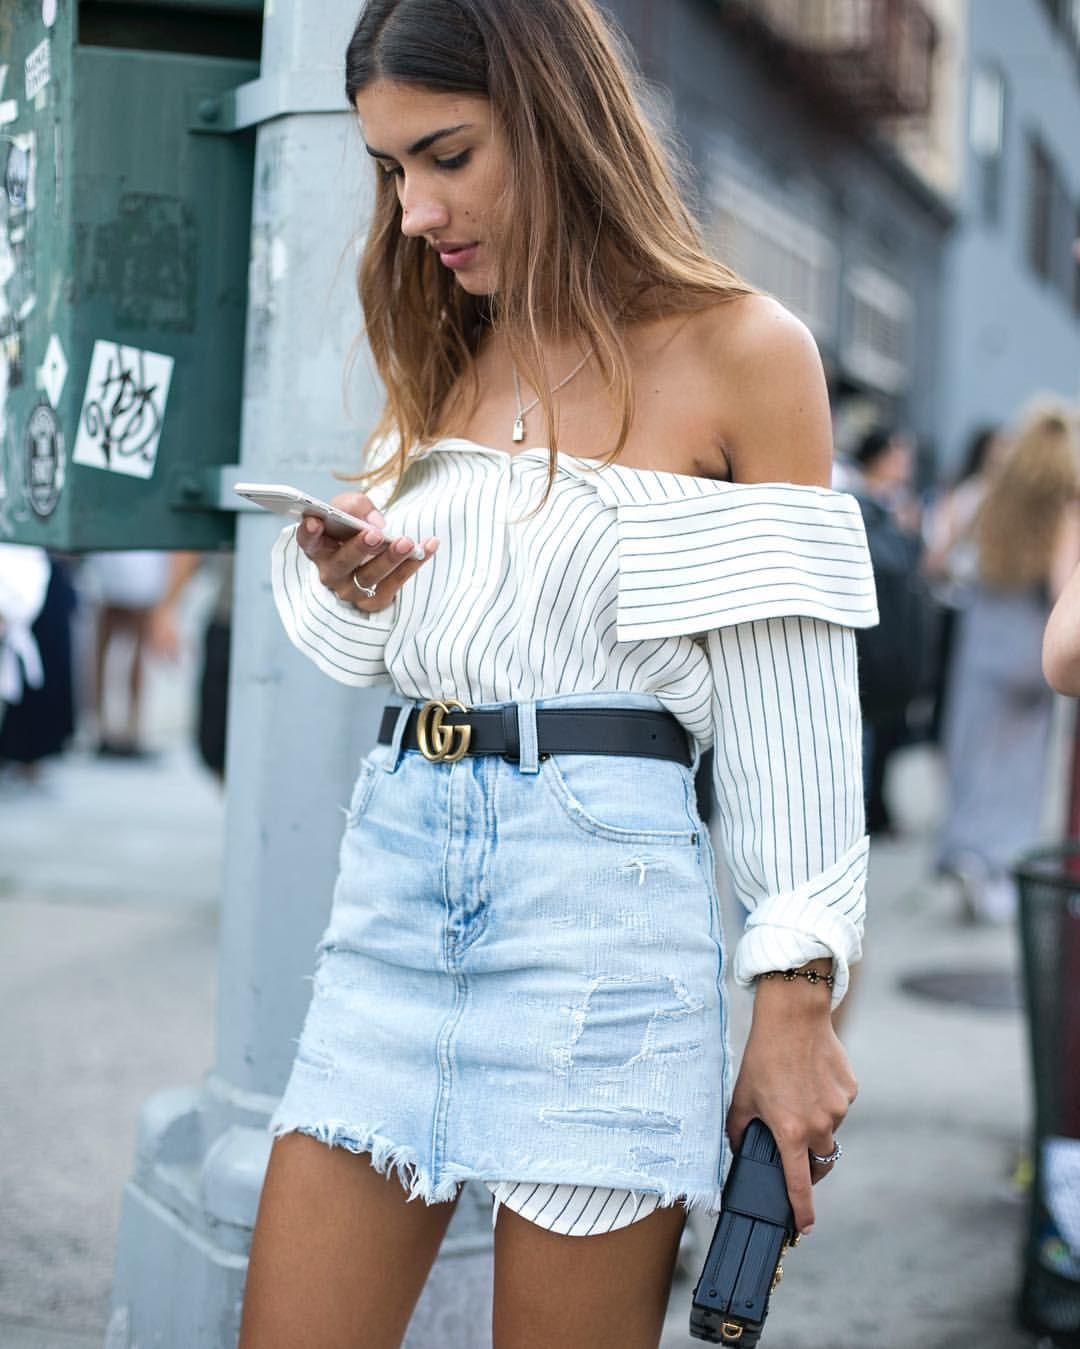 Instagram New York Streets Whatastreet